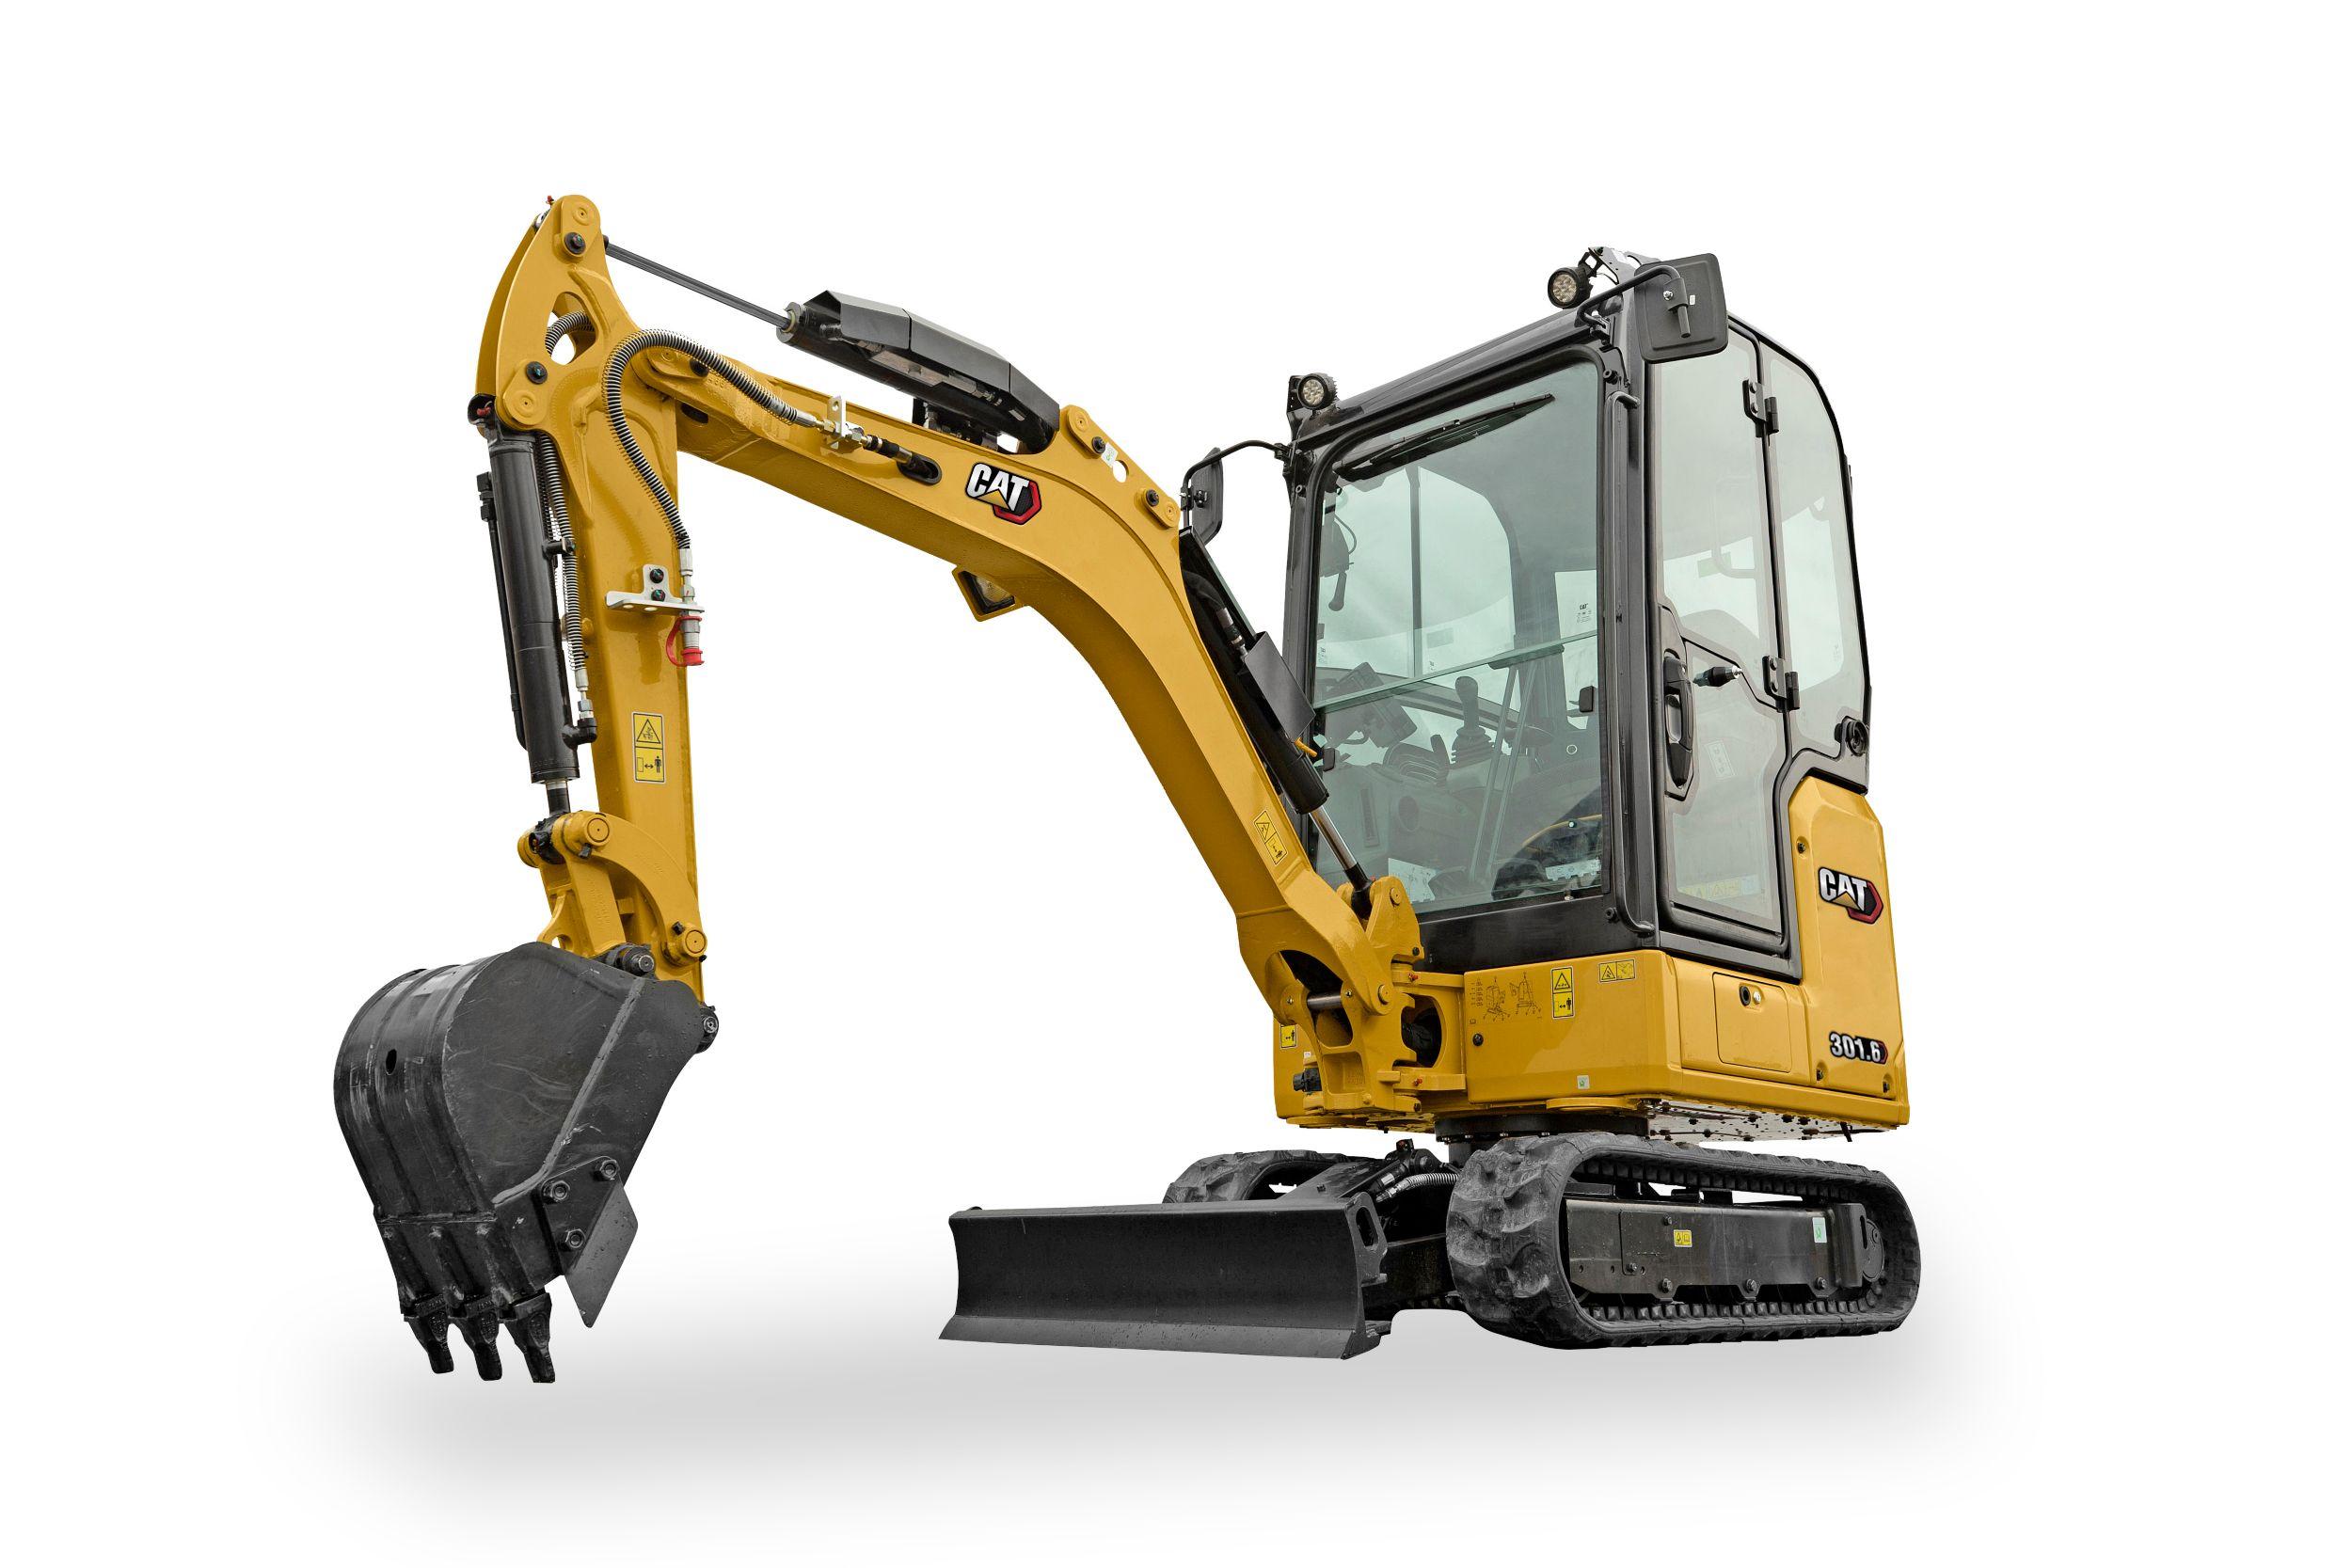 301.6 Mini Hydraulic Excavator